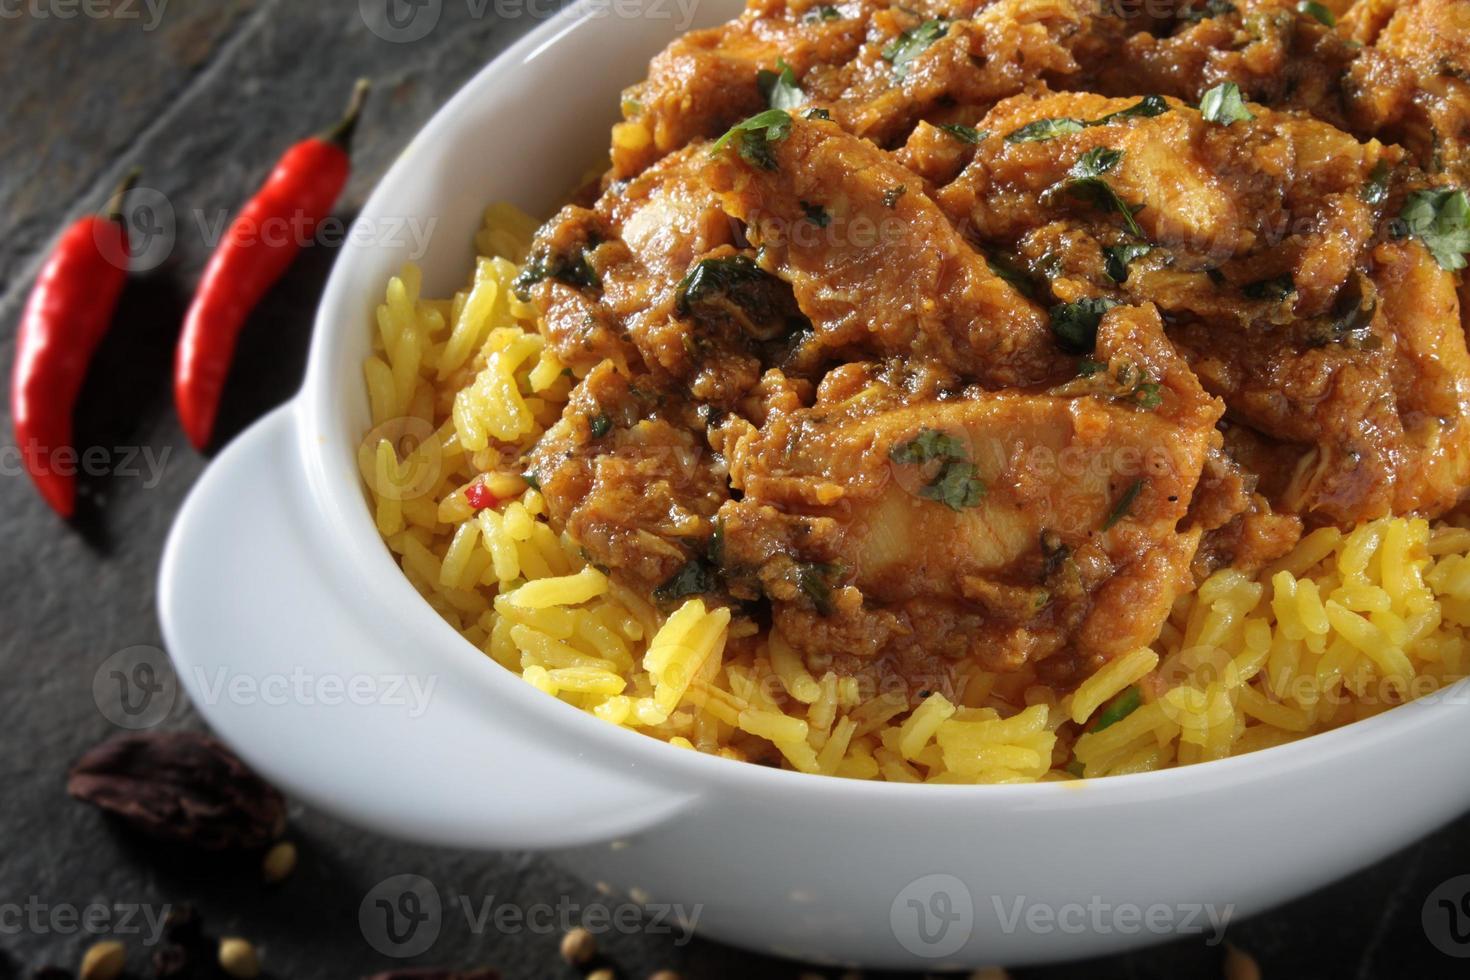 kip balti curry op witte achtergrond foto